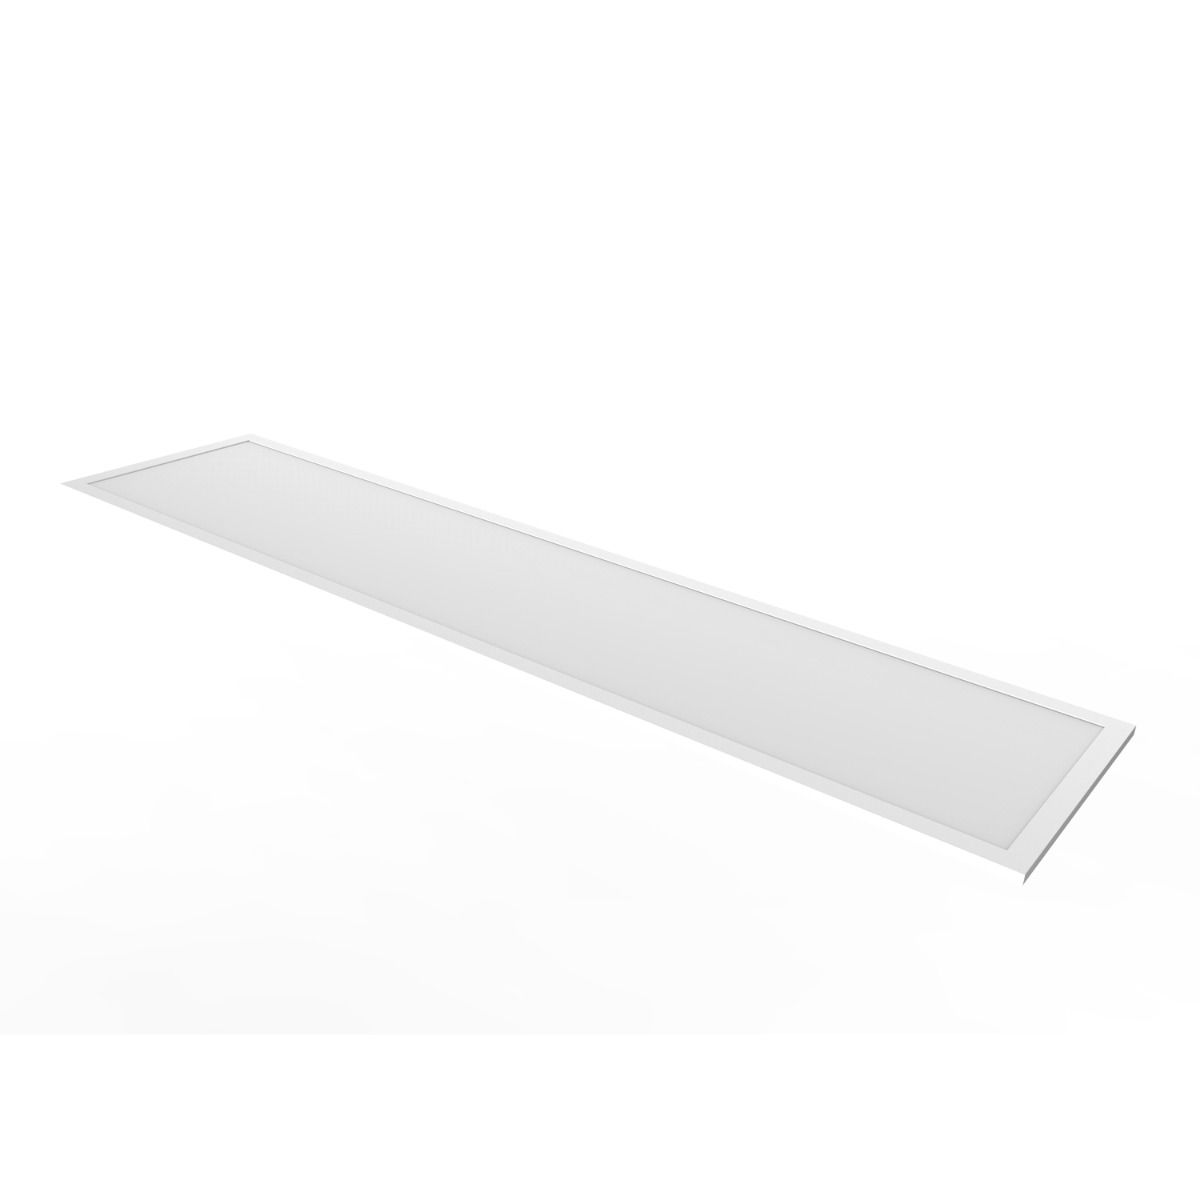 Noxion LED Panel Ecowhite V2.0 30x120cm 6500K 36W UGR <22 | Tageslichtweiß - Ersatz für 2x36W